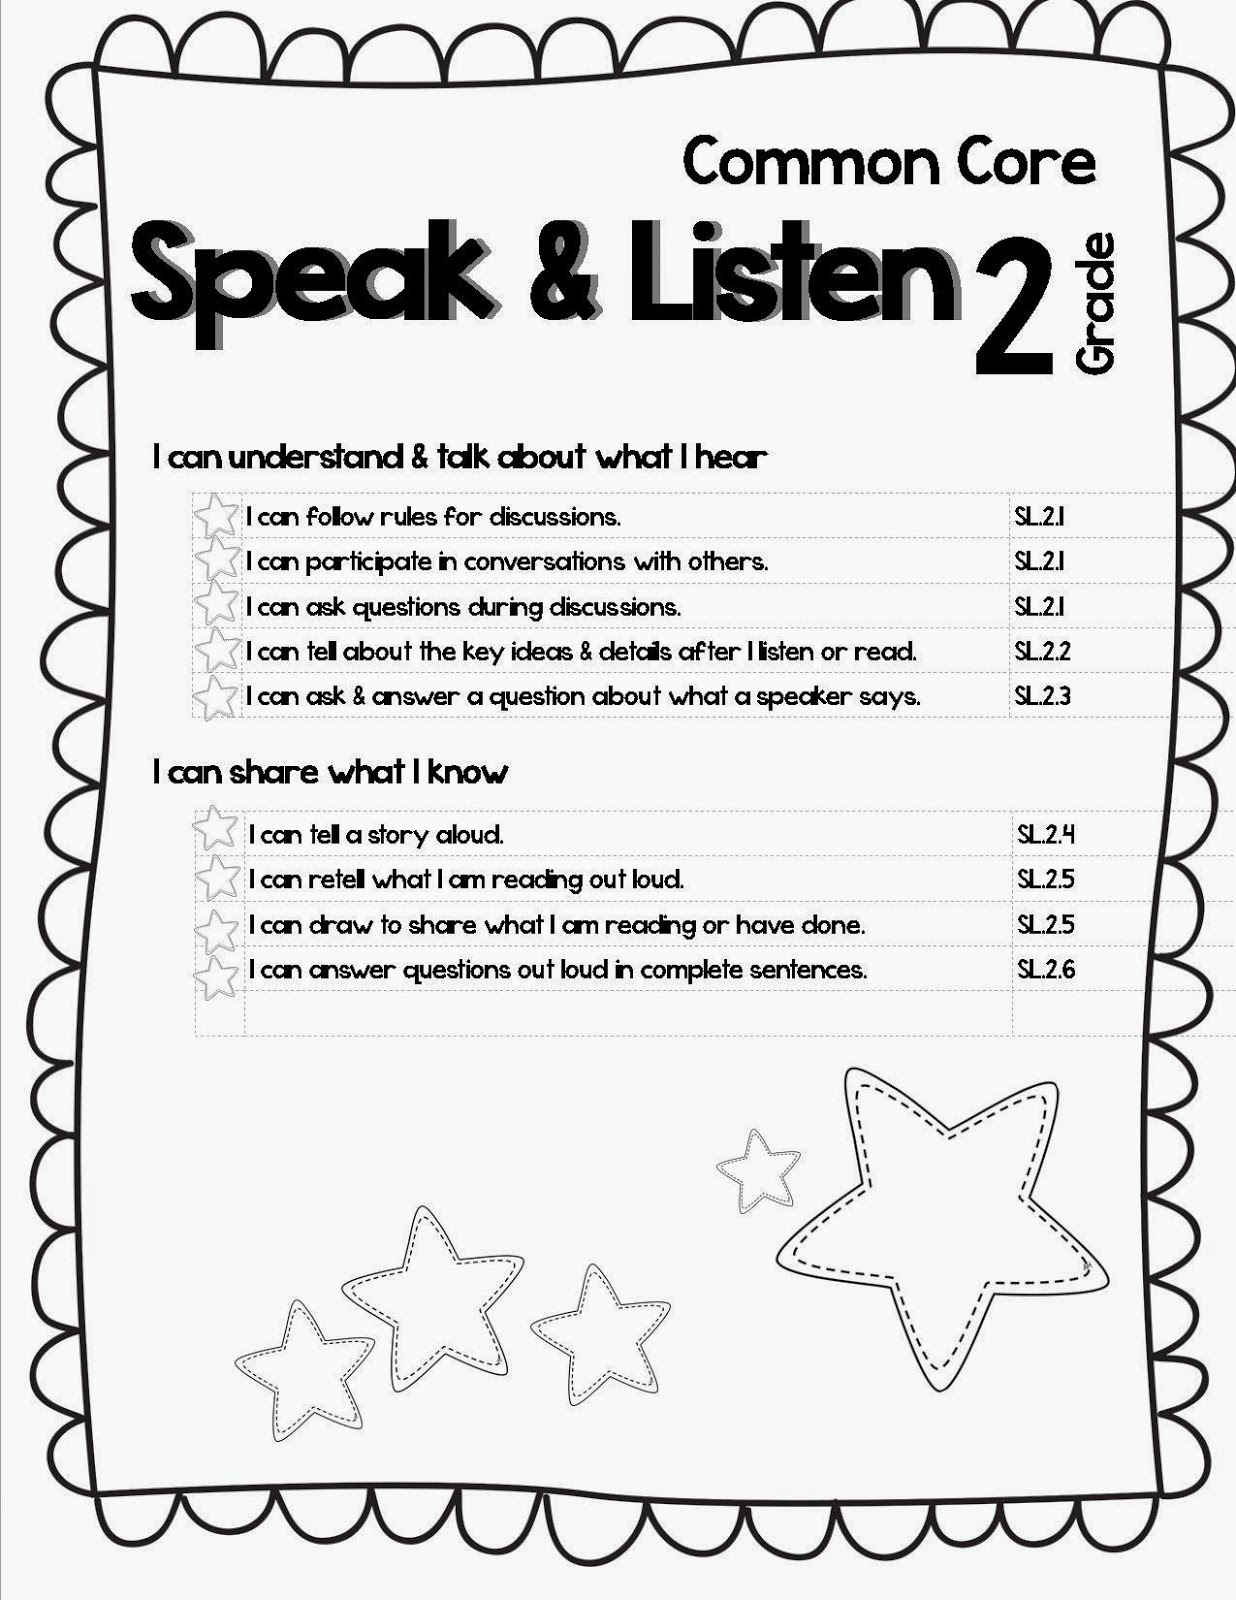 Lory S 2nd Grade Skills Student Data Portfolio Scrapbook